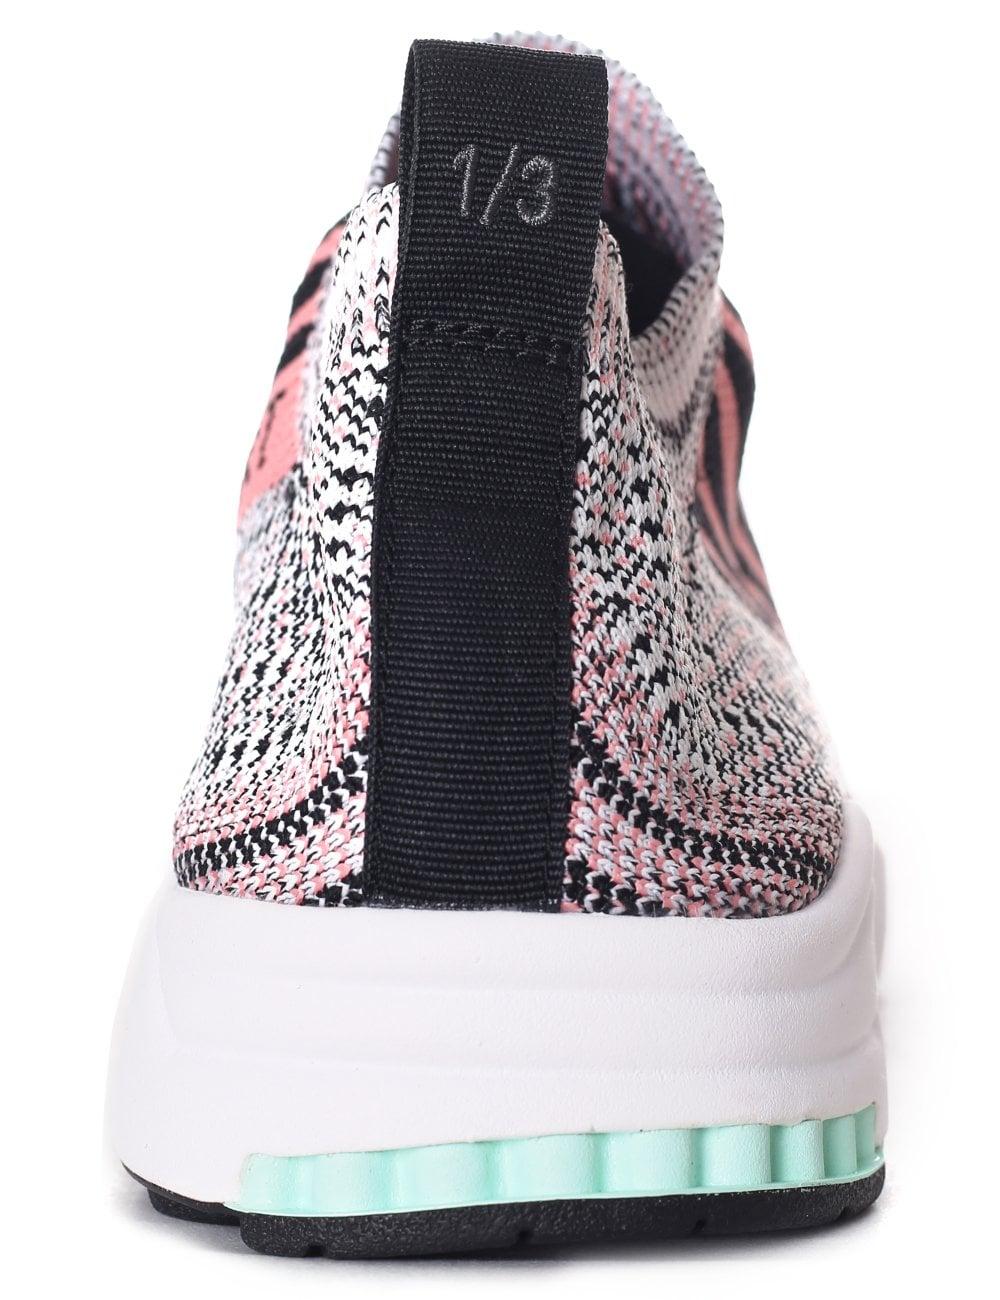 pretty nice 9e1c6 45842 Adidas Women's EQT Support Sock Primeknit Trainers